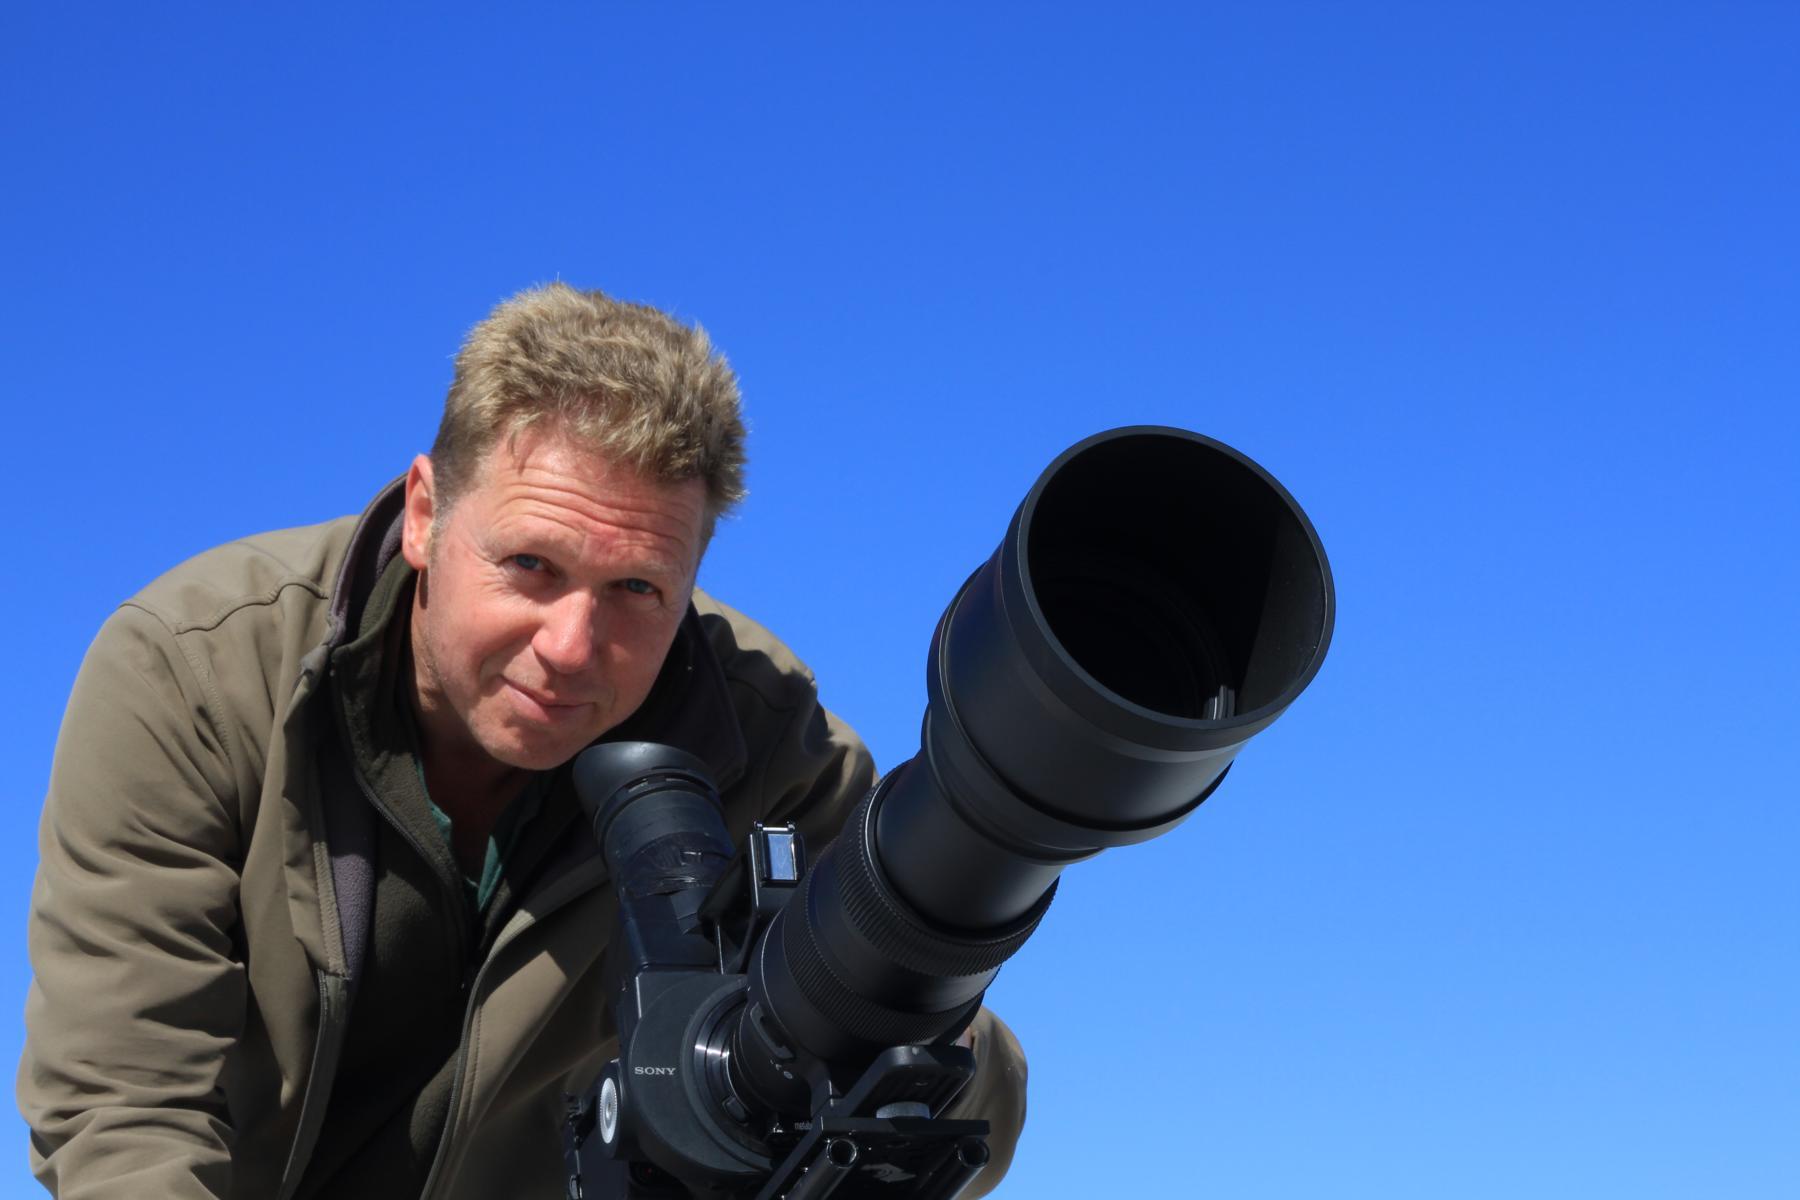 Naturfilmer Jens Klingebiel